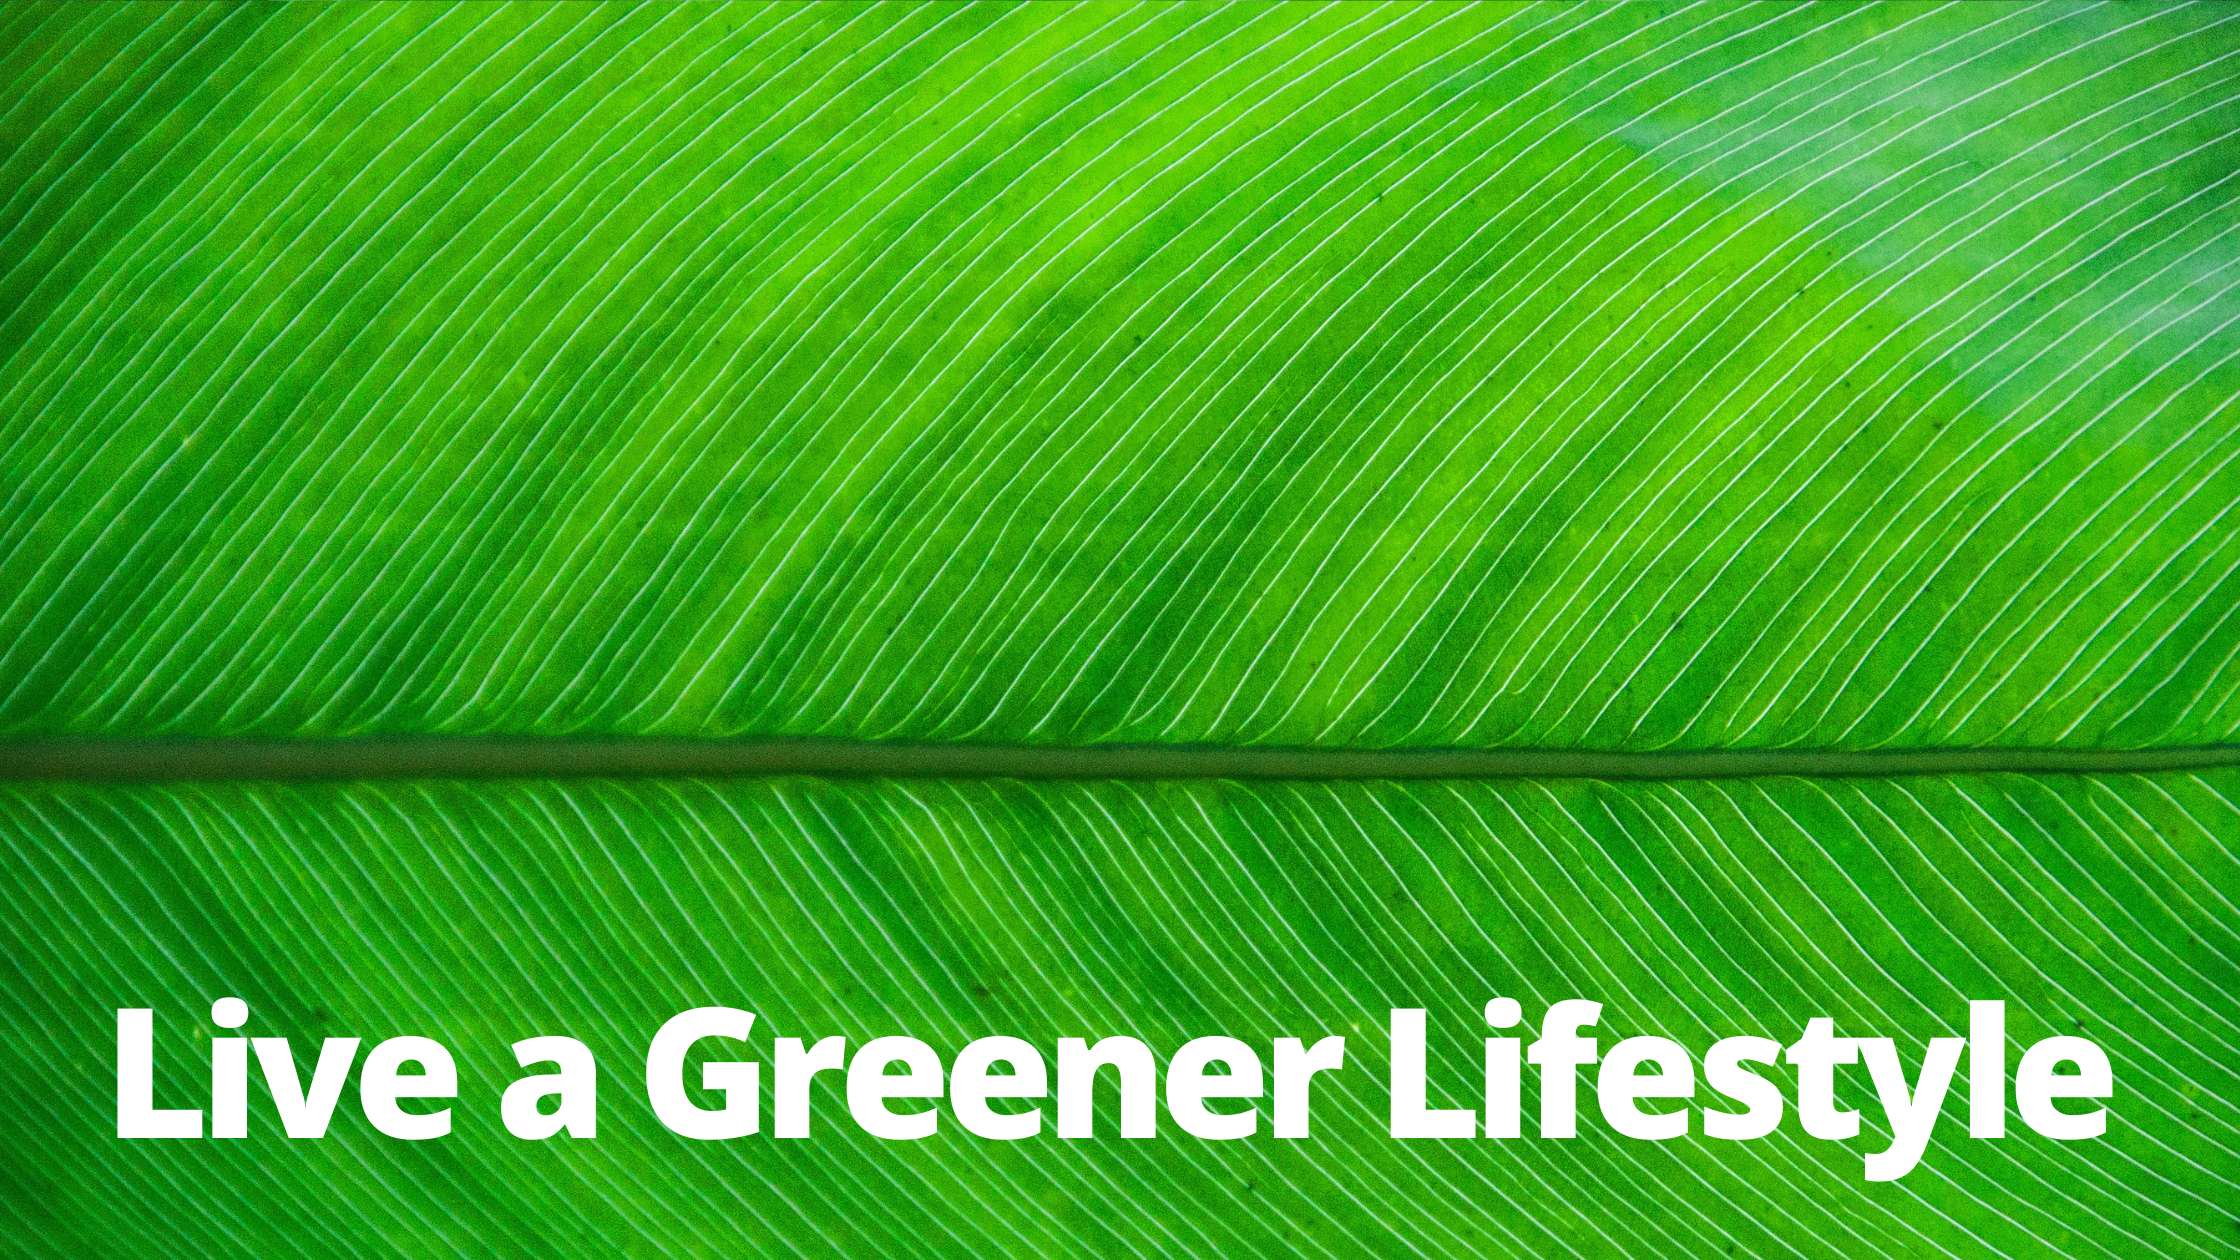 Eco-friendly, environment, sustainability